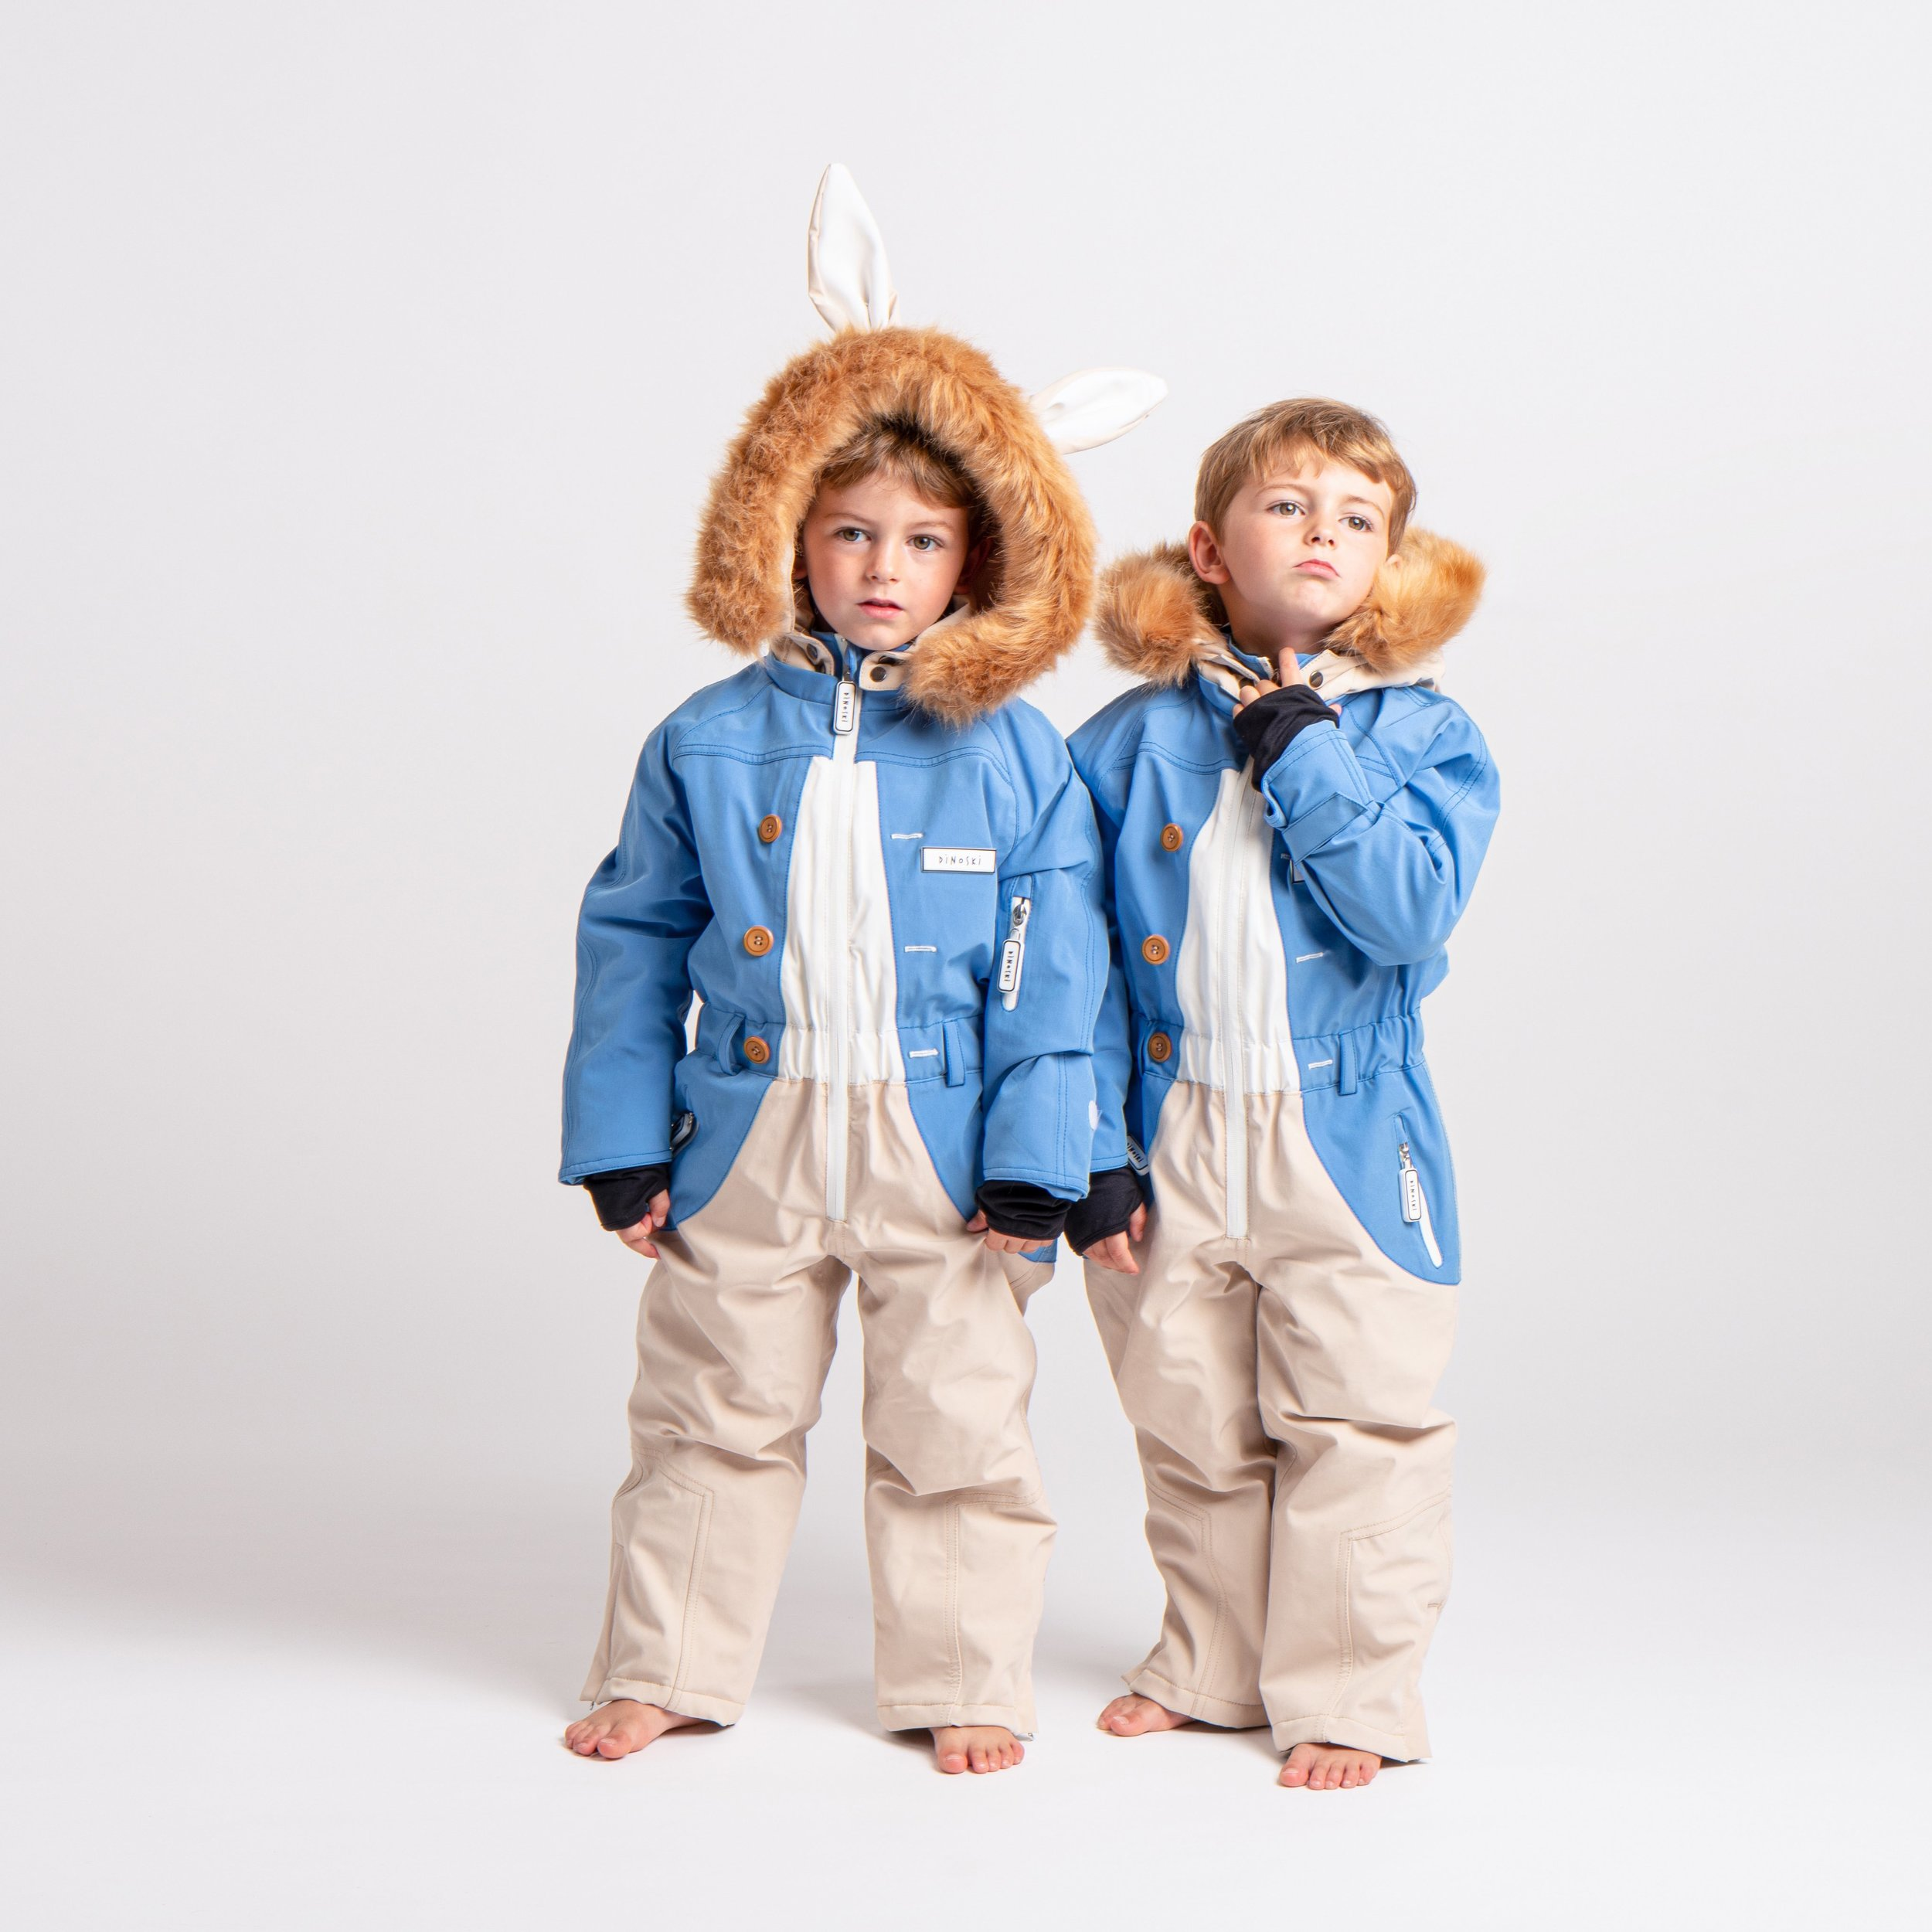 Dinoski-Peter Rabbit-Twins2.jpg